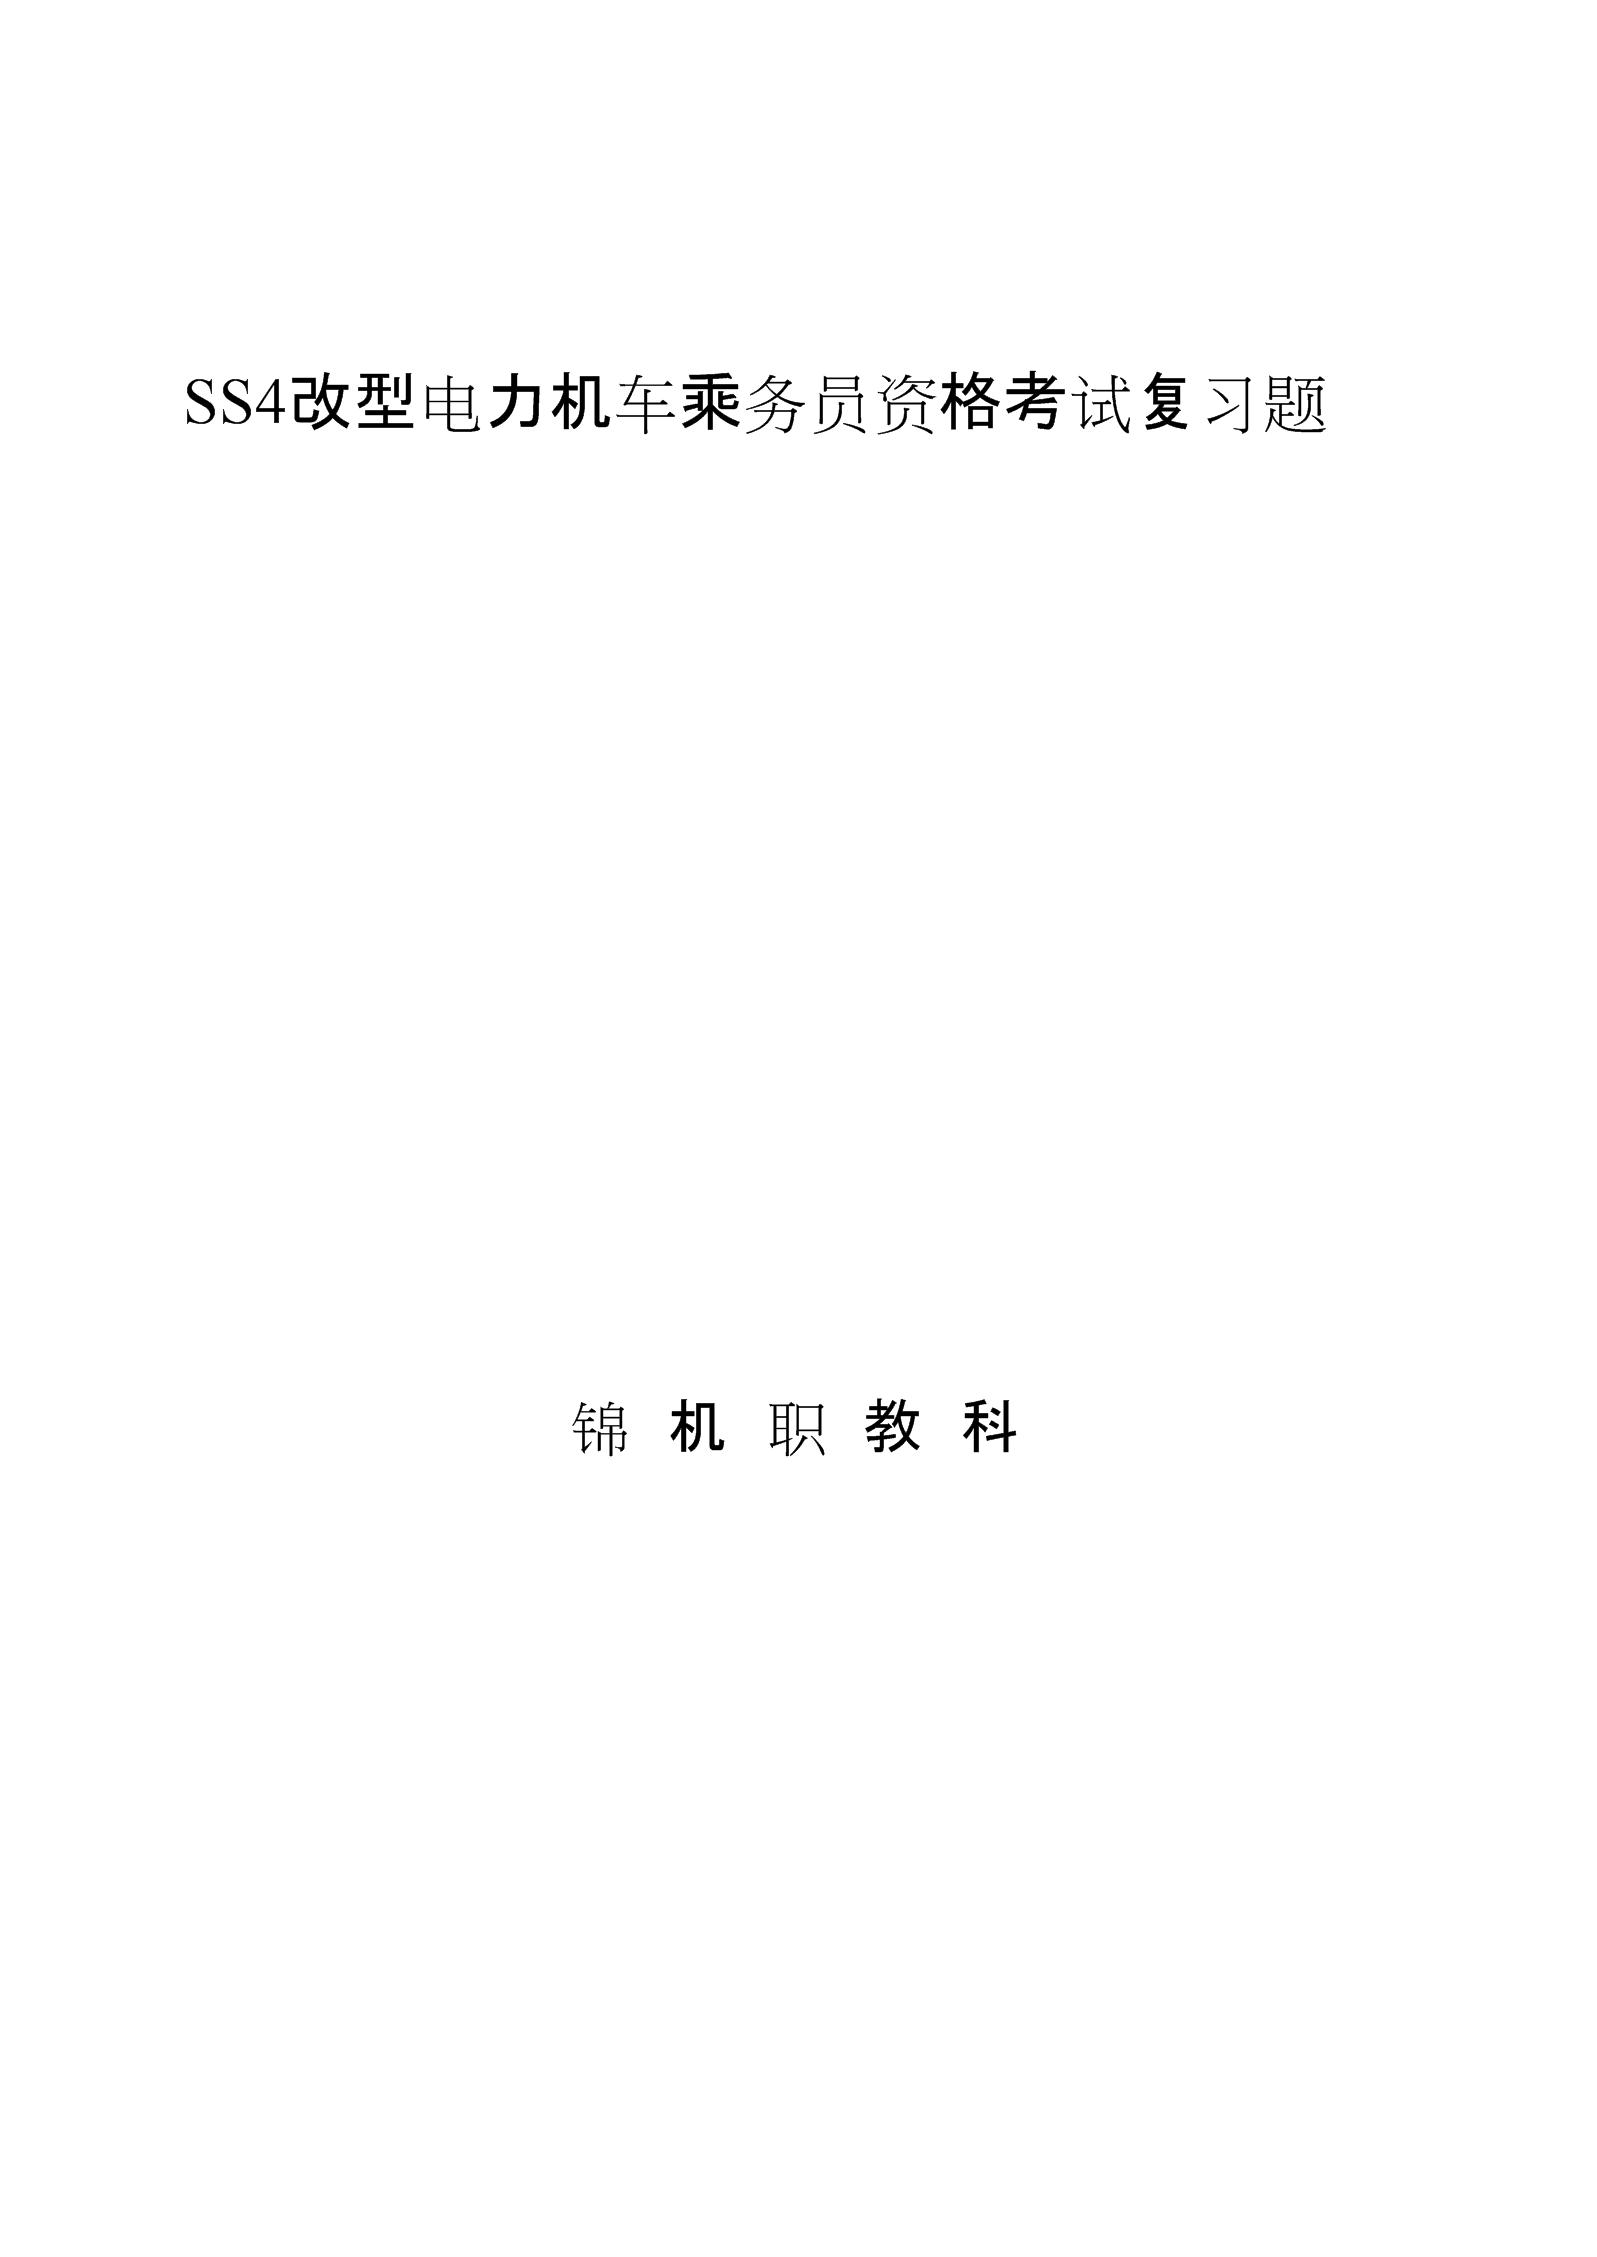 SS4改型电力机车乘务员资格考试复习题.docx